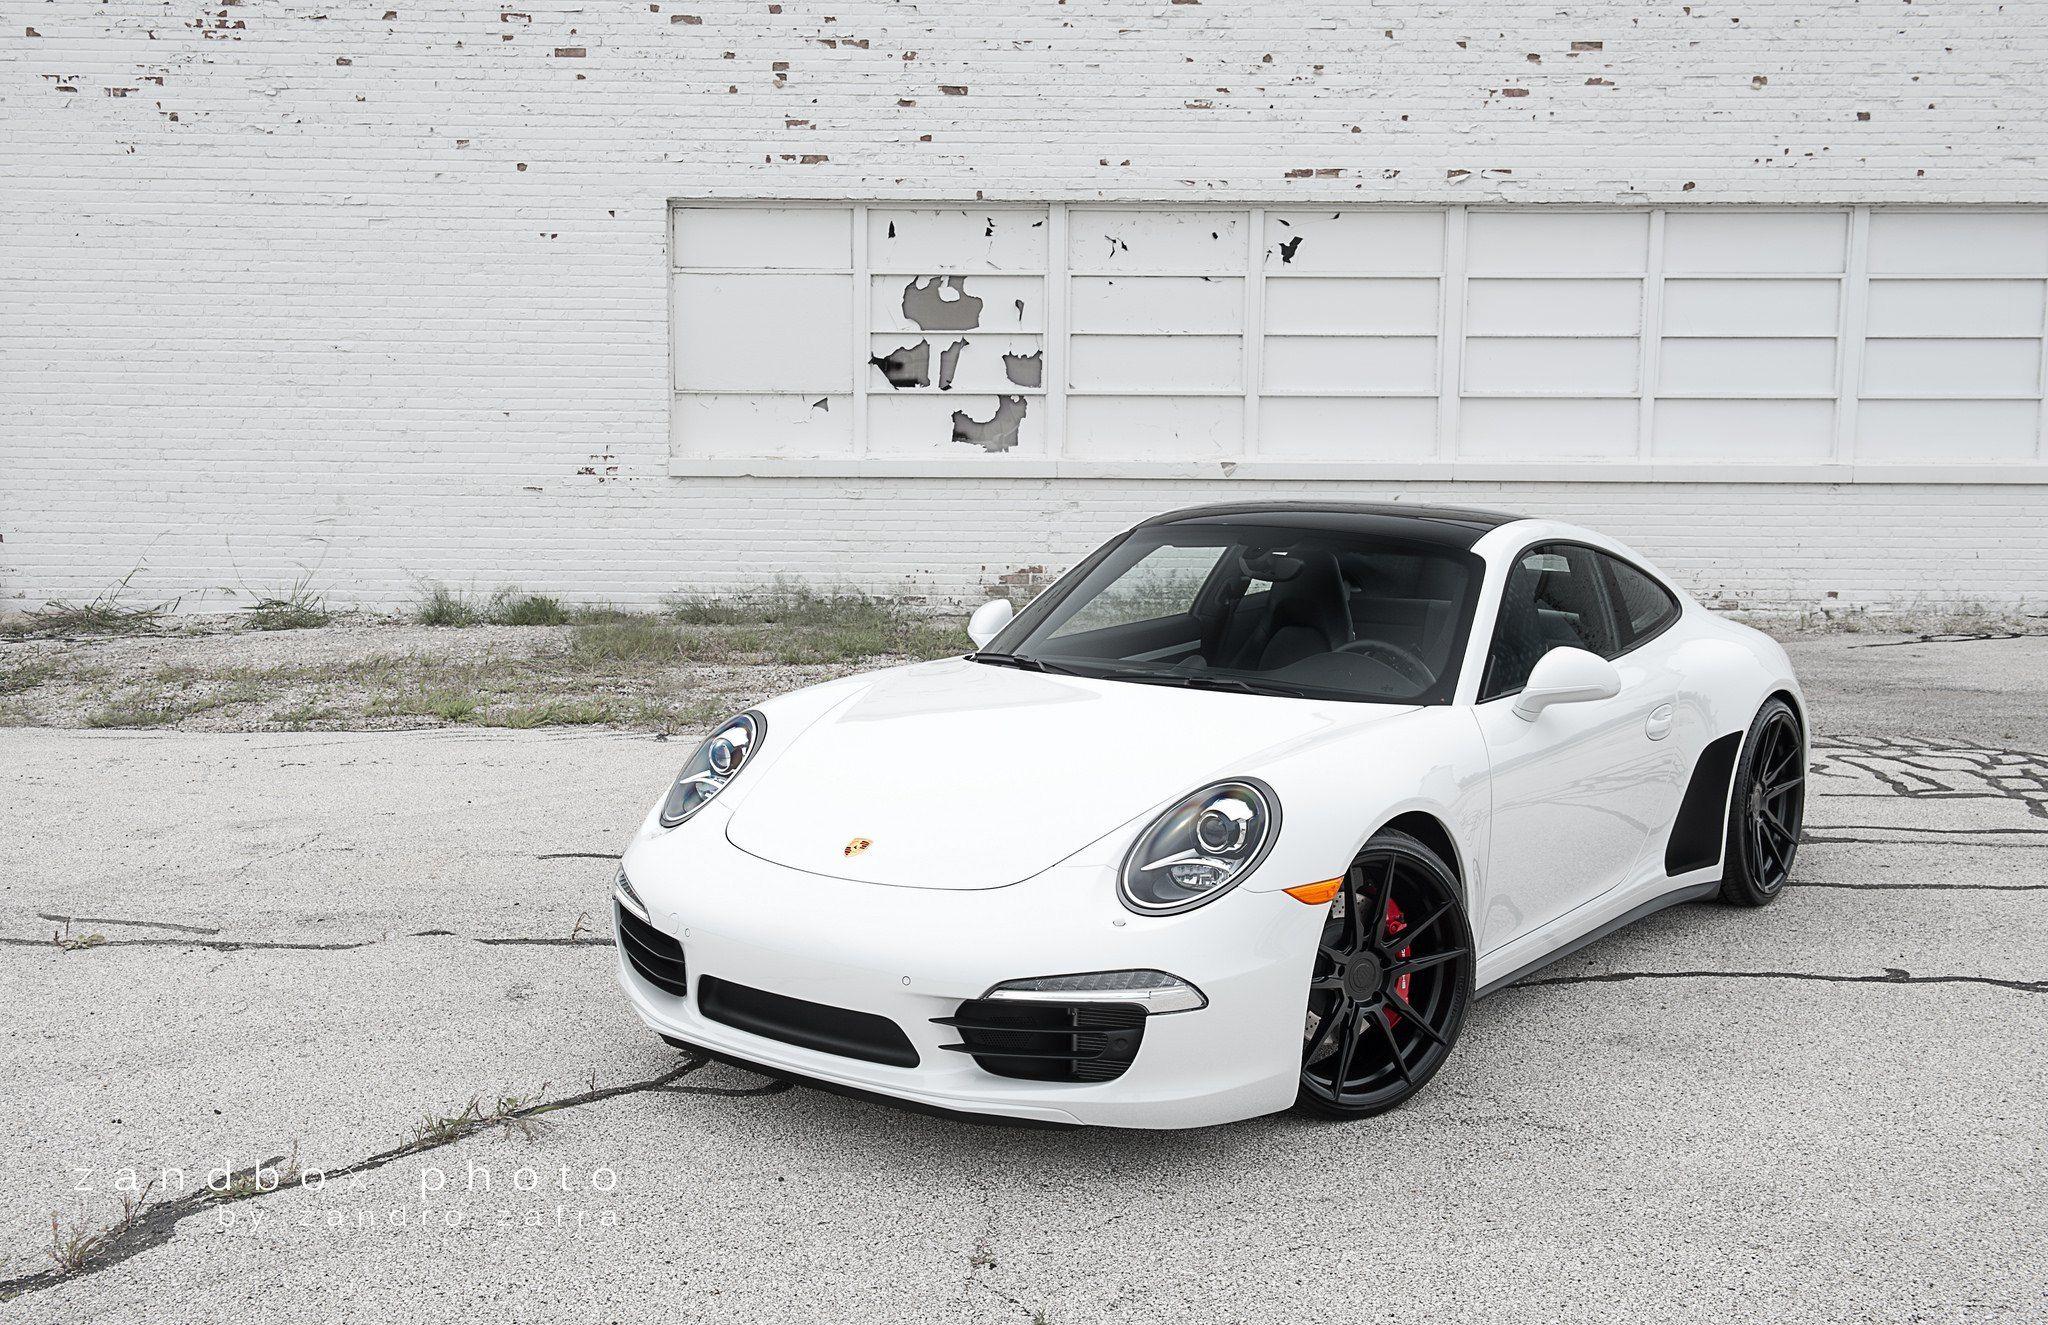 Pin By Jason Cobb On Cars Black Rims Car Porsche Porsche 911 Carrera 4s